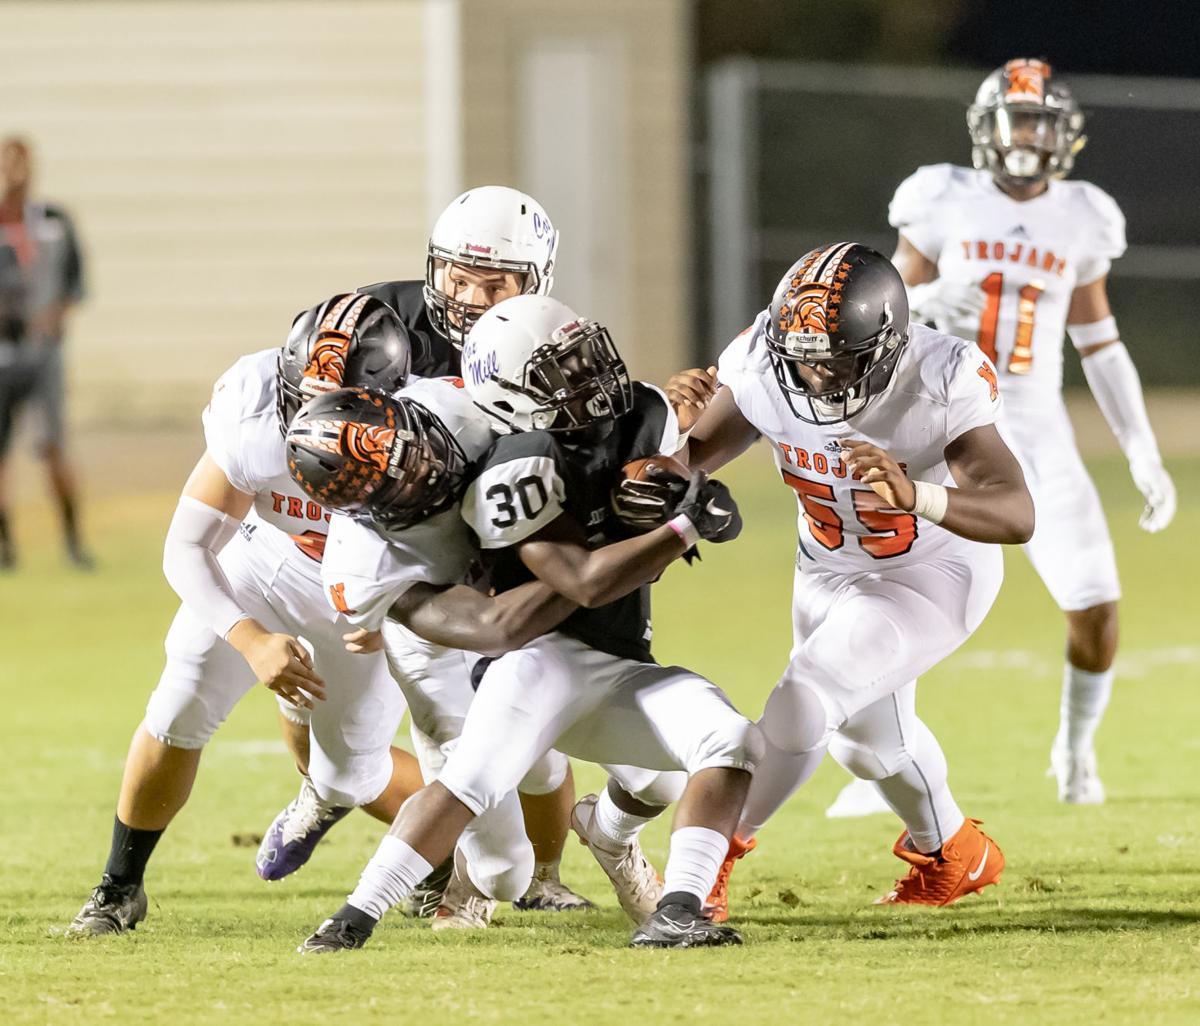 North Carolina high school football action